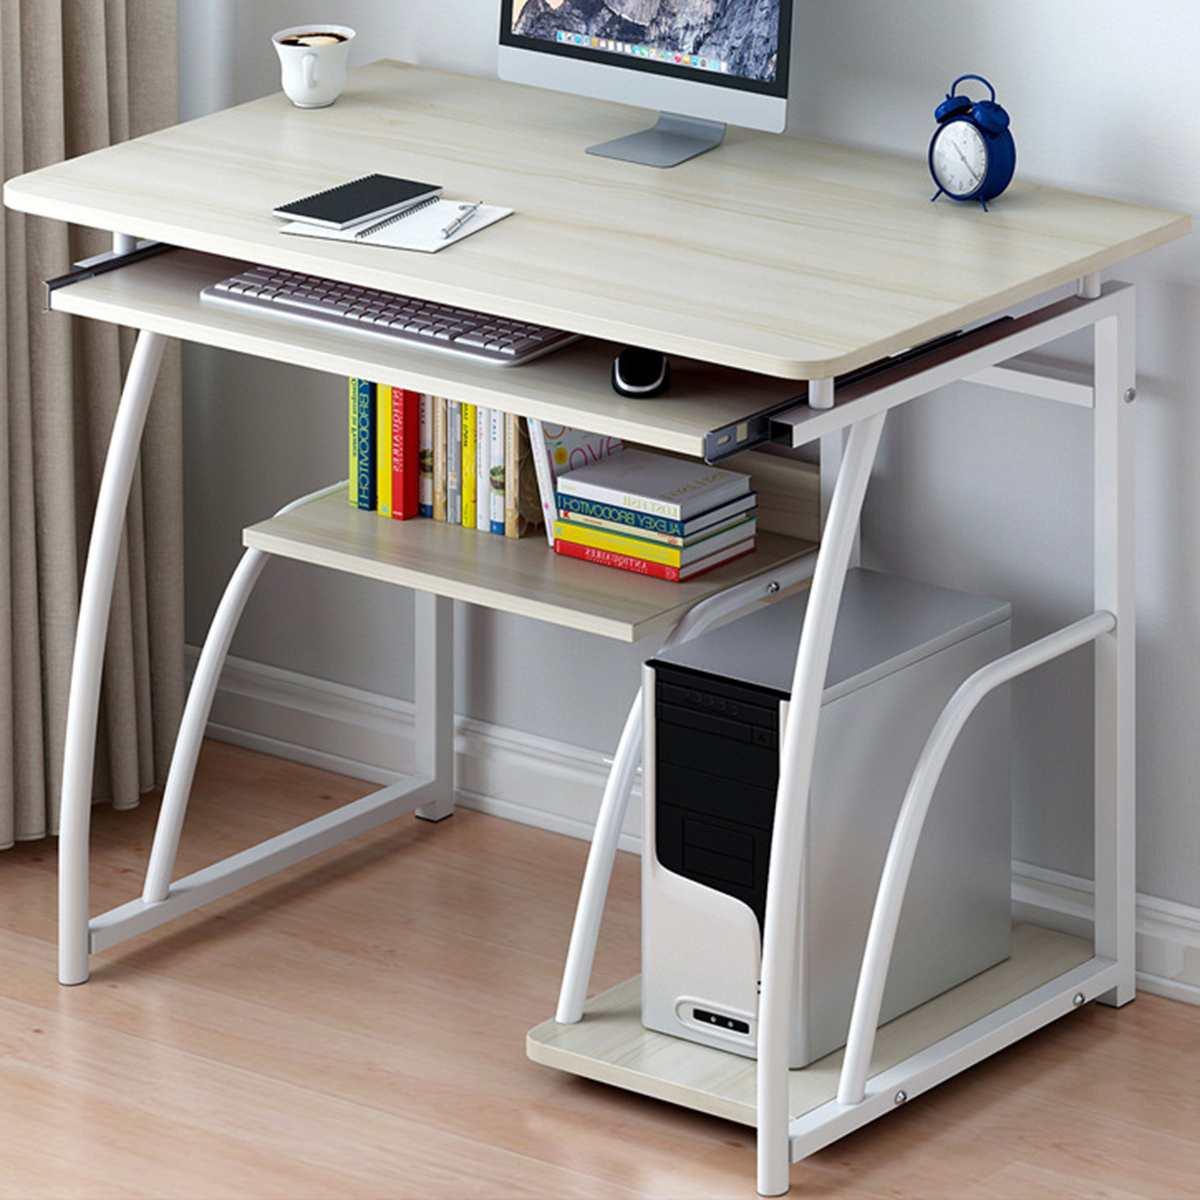 Computer Table Laptop Desk With Keyboard Bracket Laptop Bed Table Floor Standing Desk Home Office Furniture 71cm